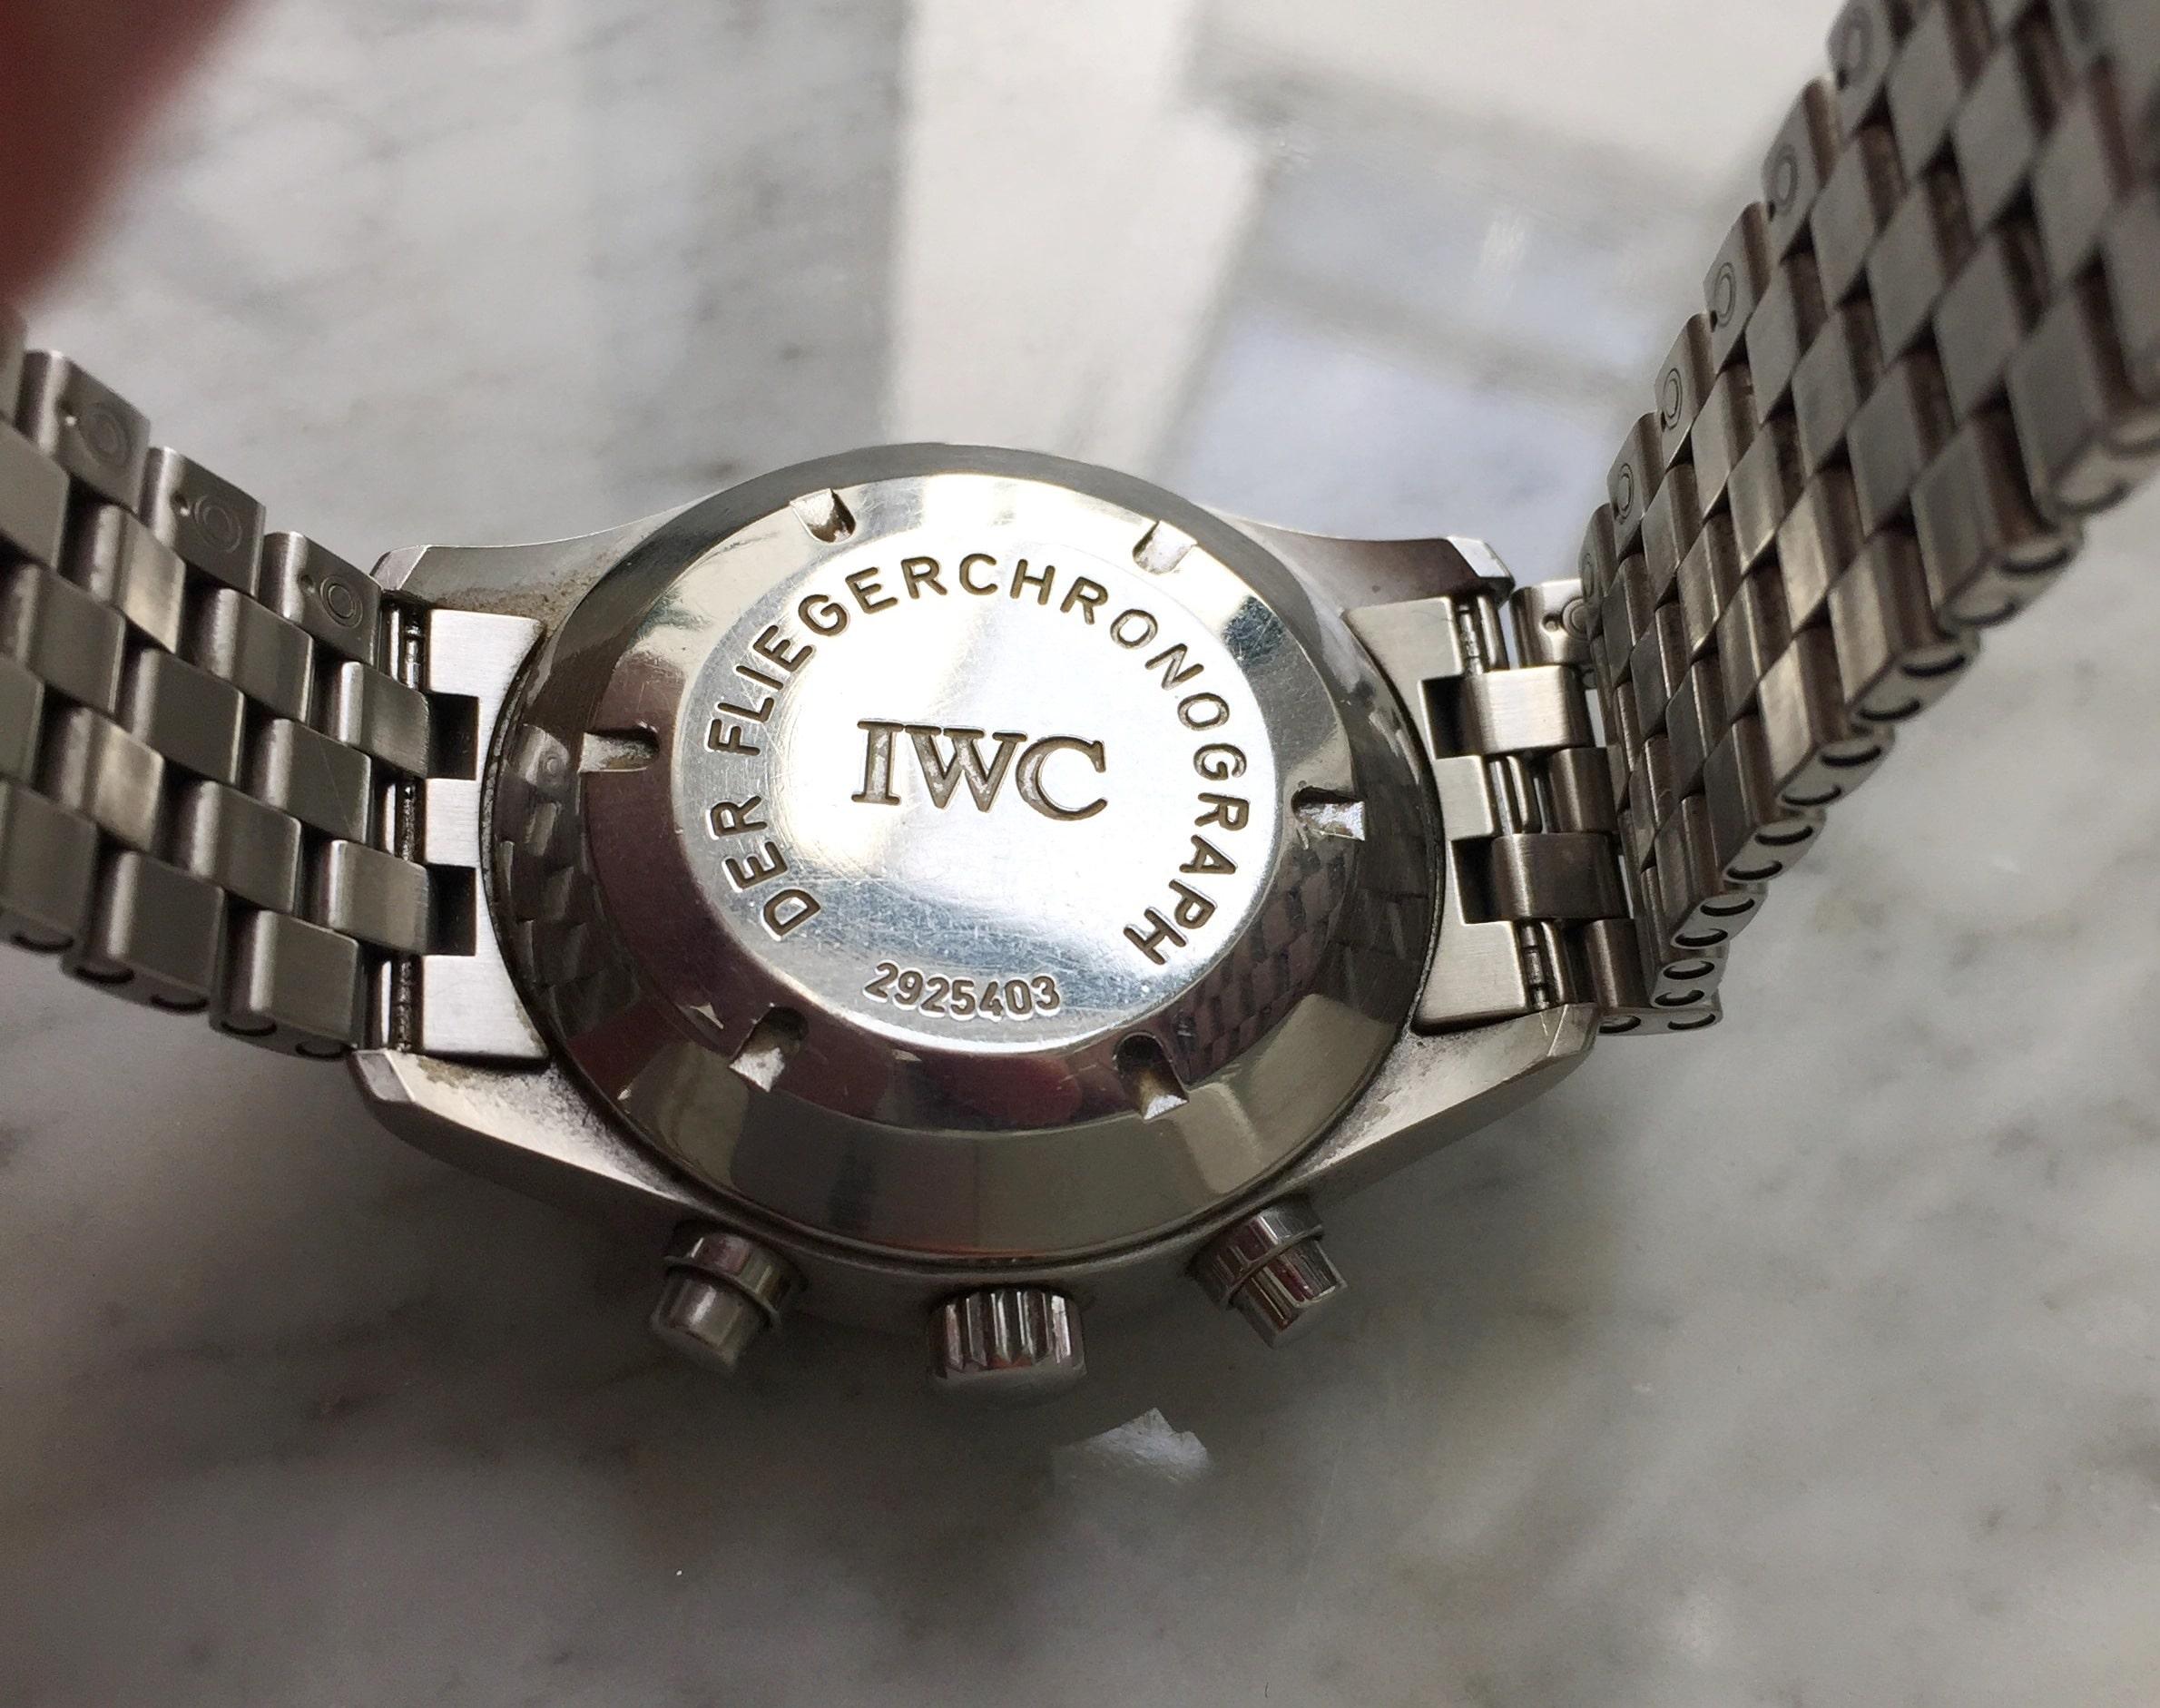 IWC Der Fliegerchronograph Full Set